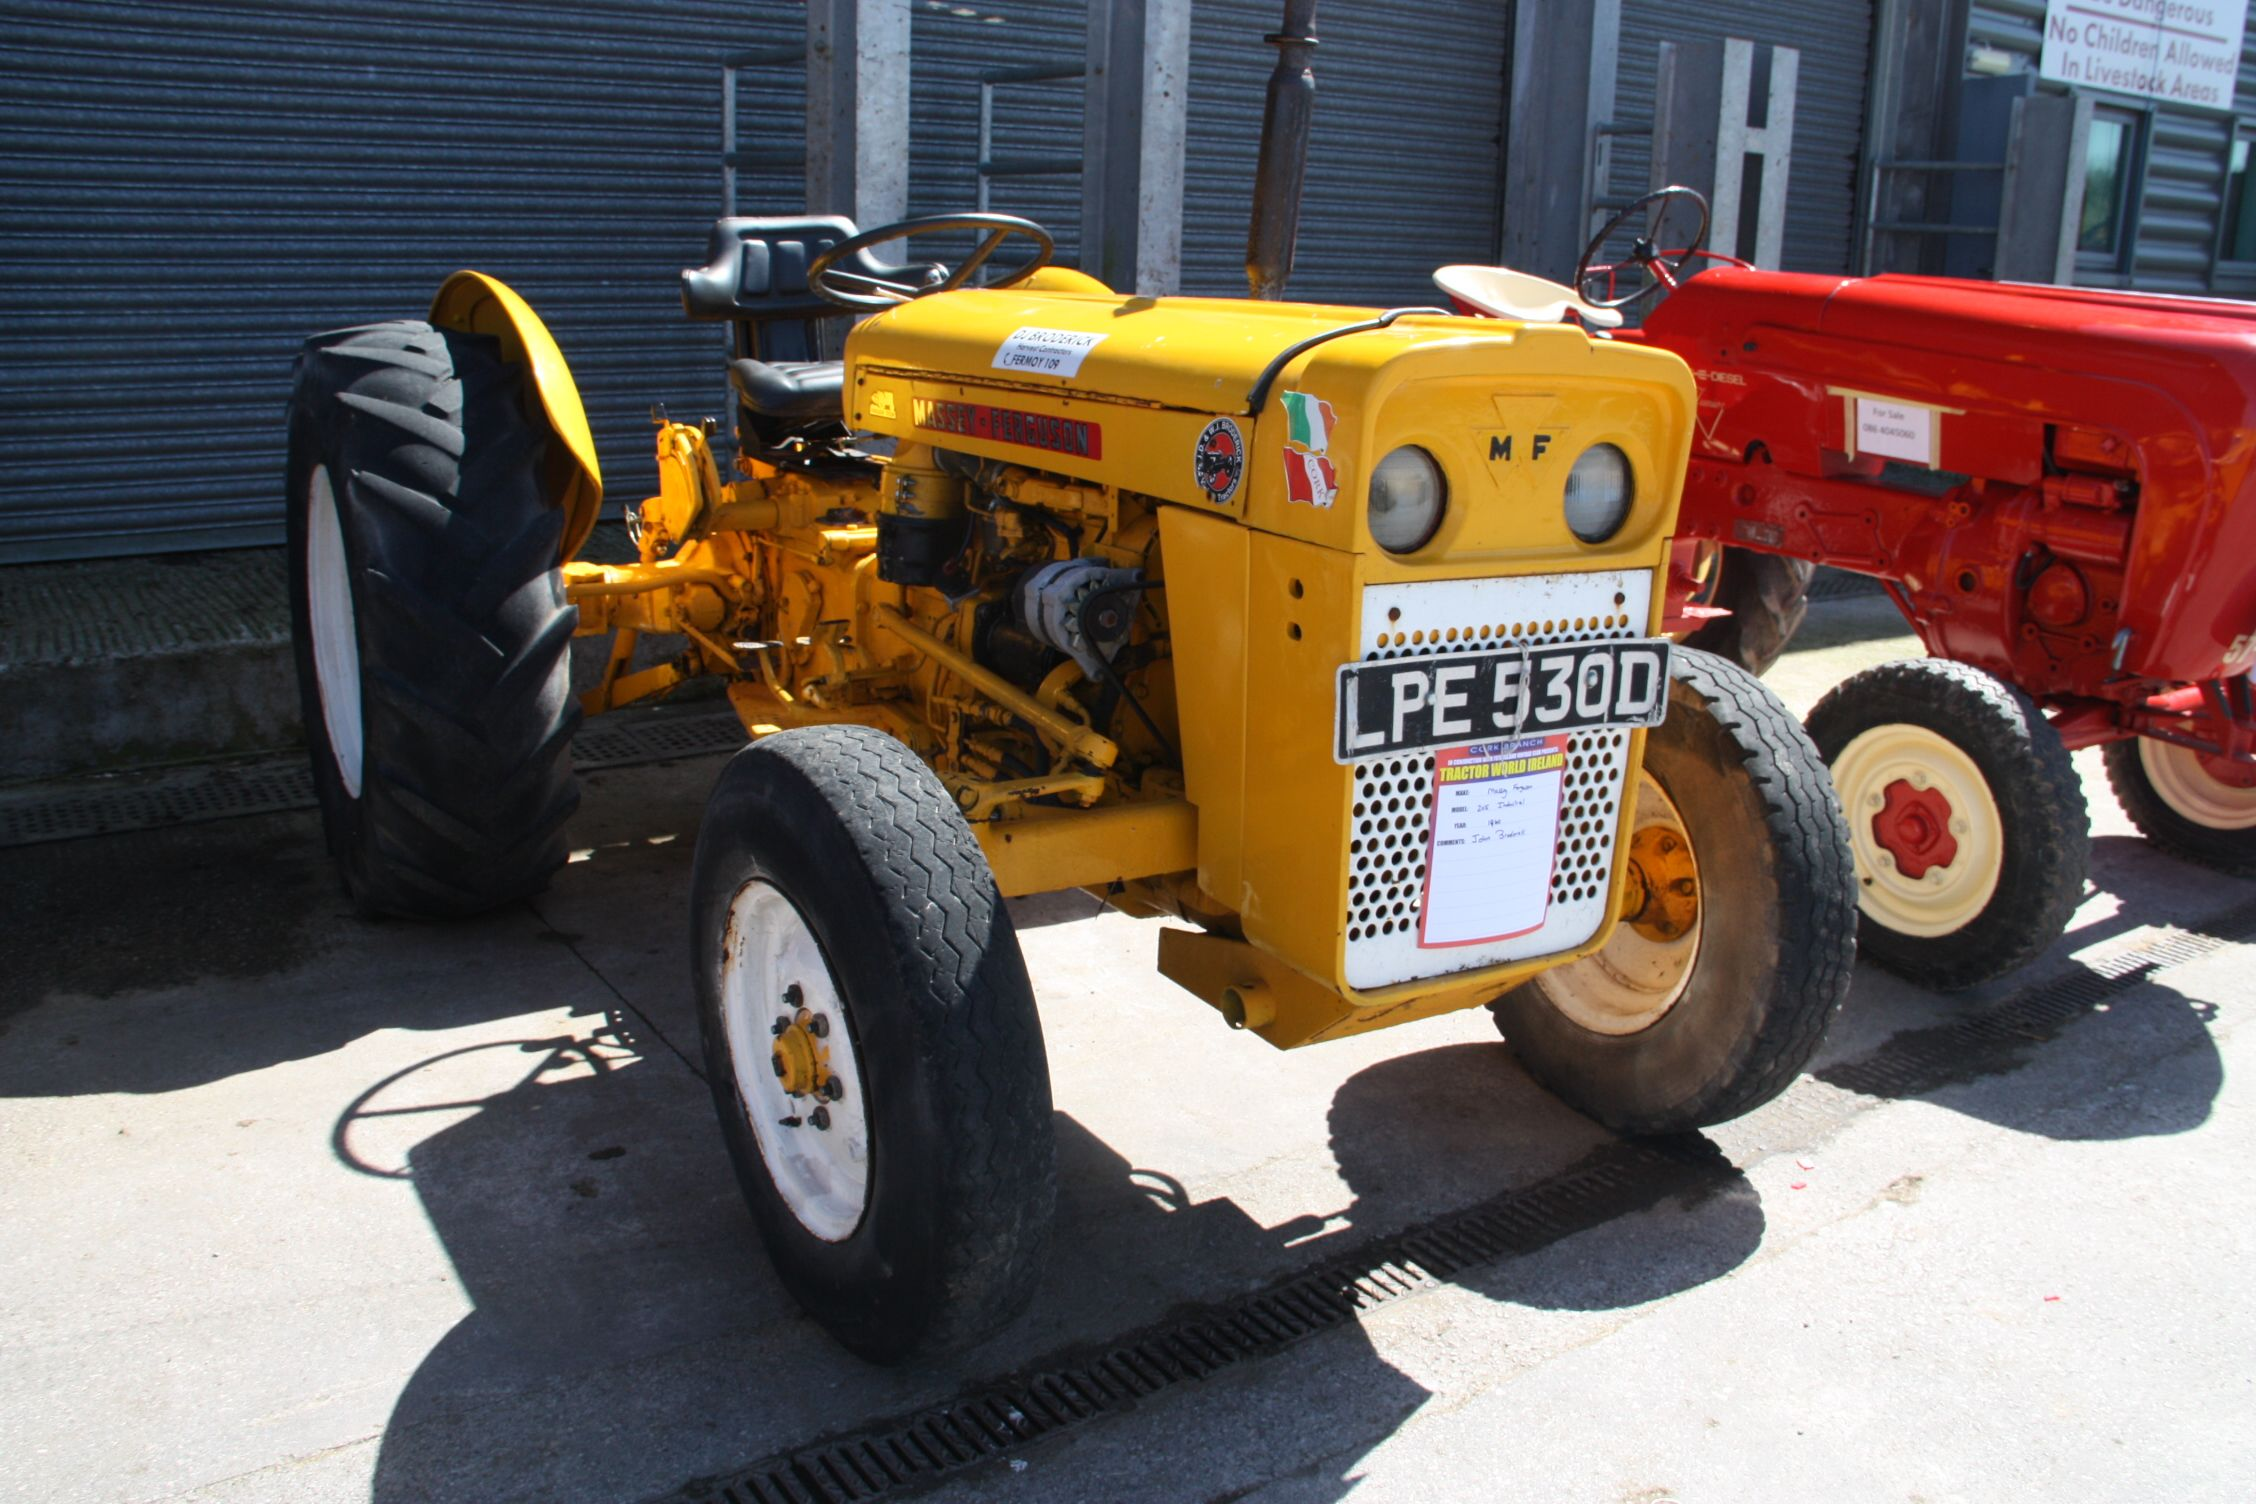 Massey-Ferguson 205 Industrial Tractors, Farming, Barns, Country Barns,  Tractor Pulling